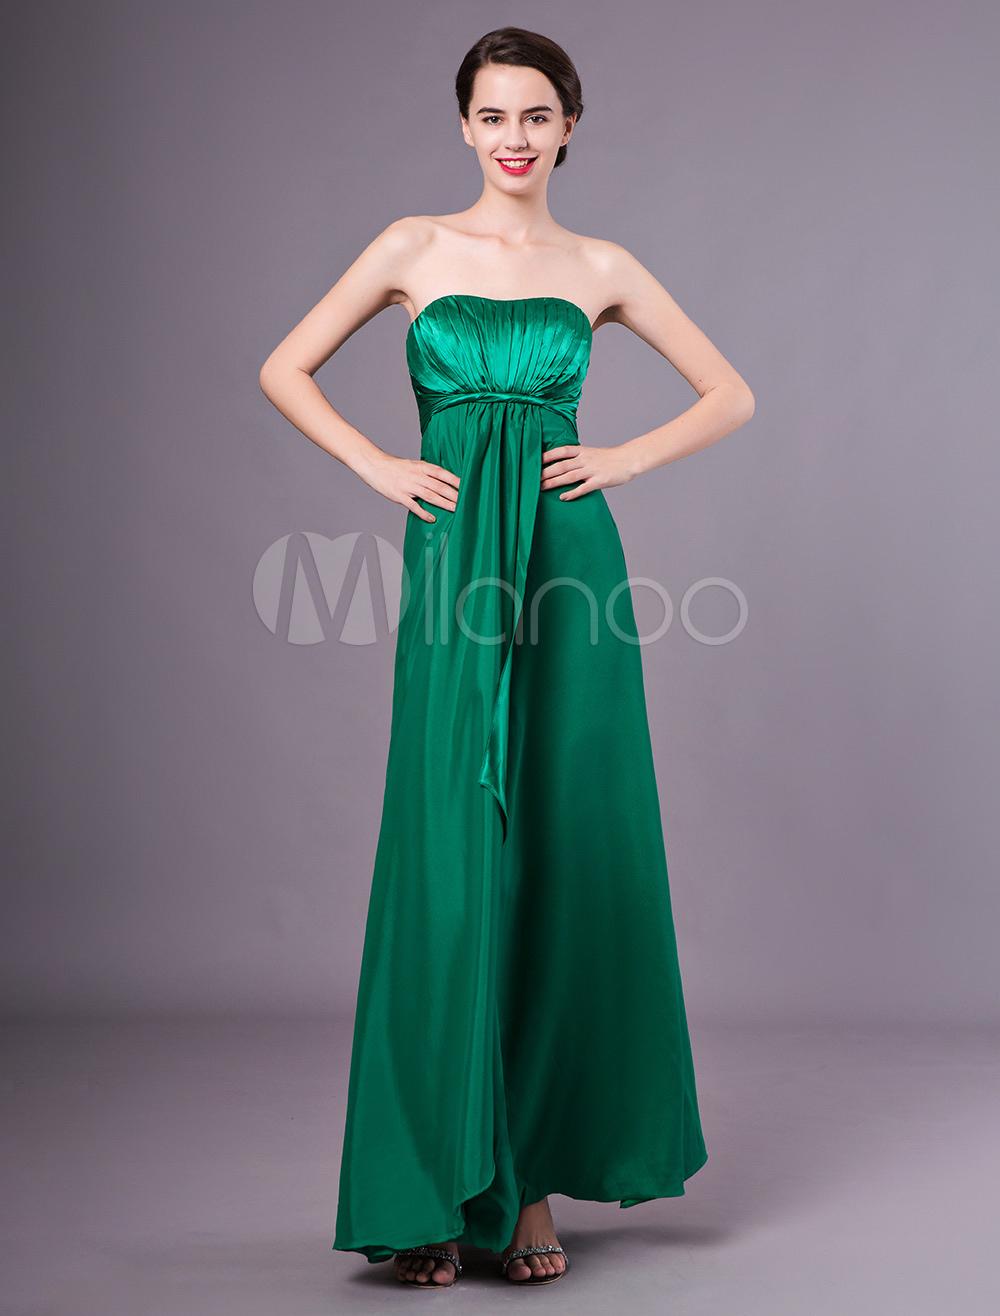 Etui brautjungfernkleid in dunkelgr n kleider f r - Kleider milanoo ...